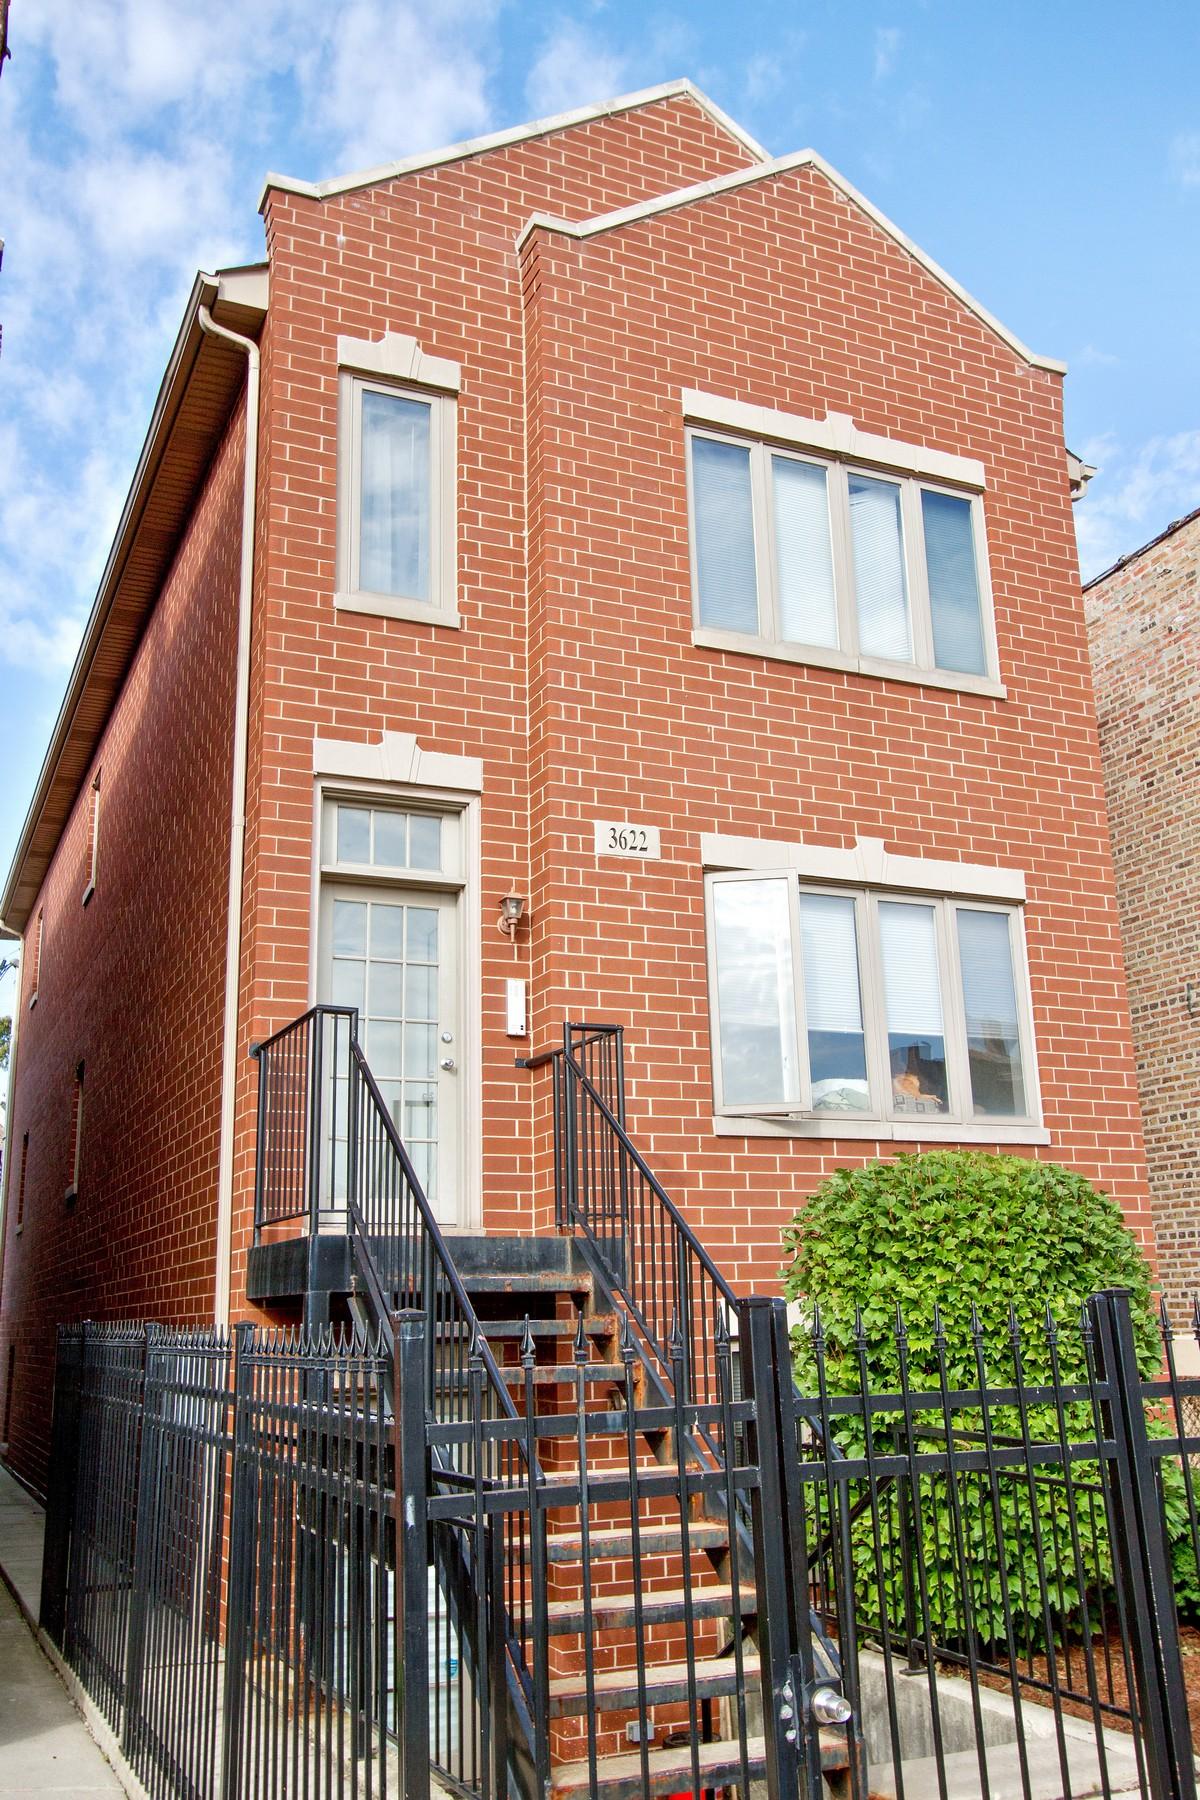 Apartamentos multi-familiares para Venda às Great Investment Property 3622 S Hoyne Avenue Chicago, Illinois 60609 Estados Unidos